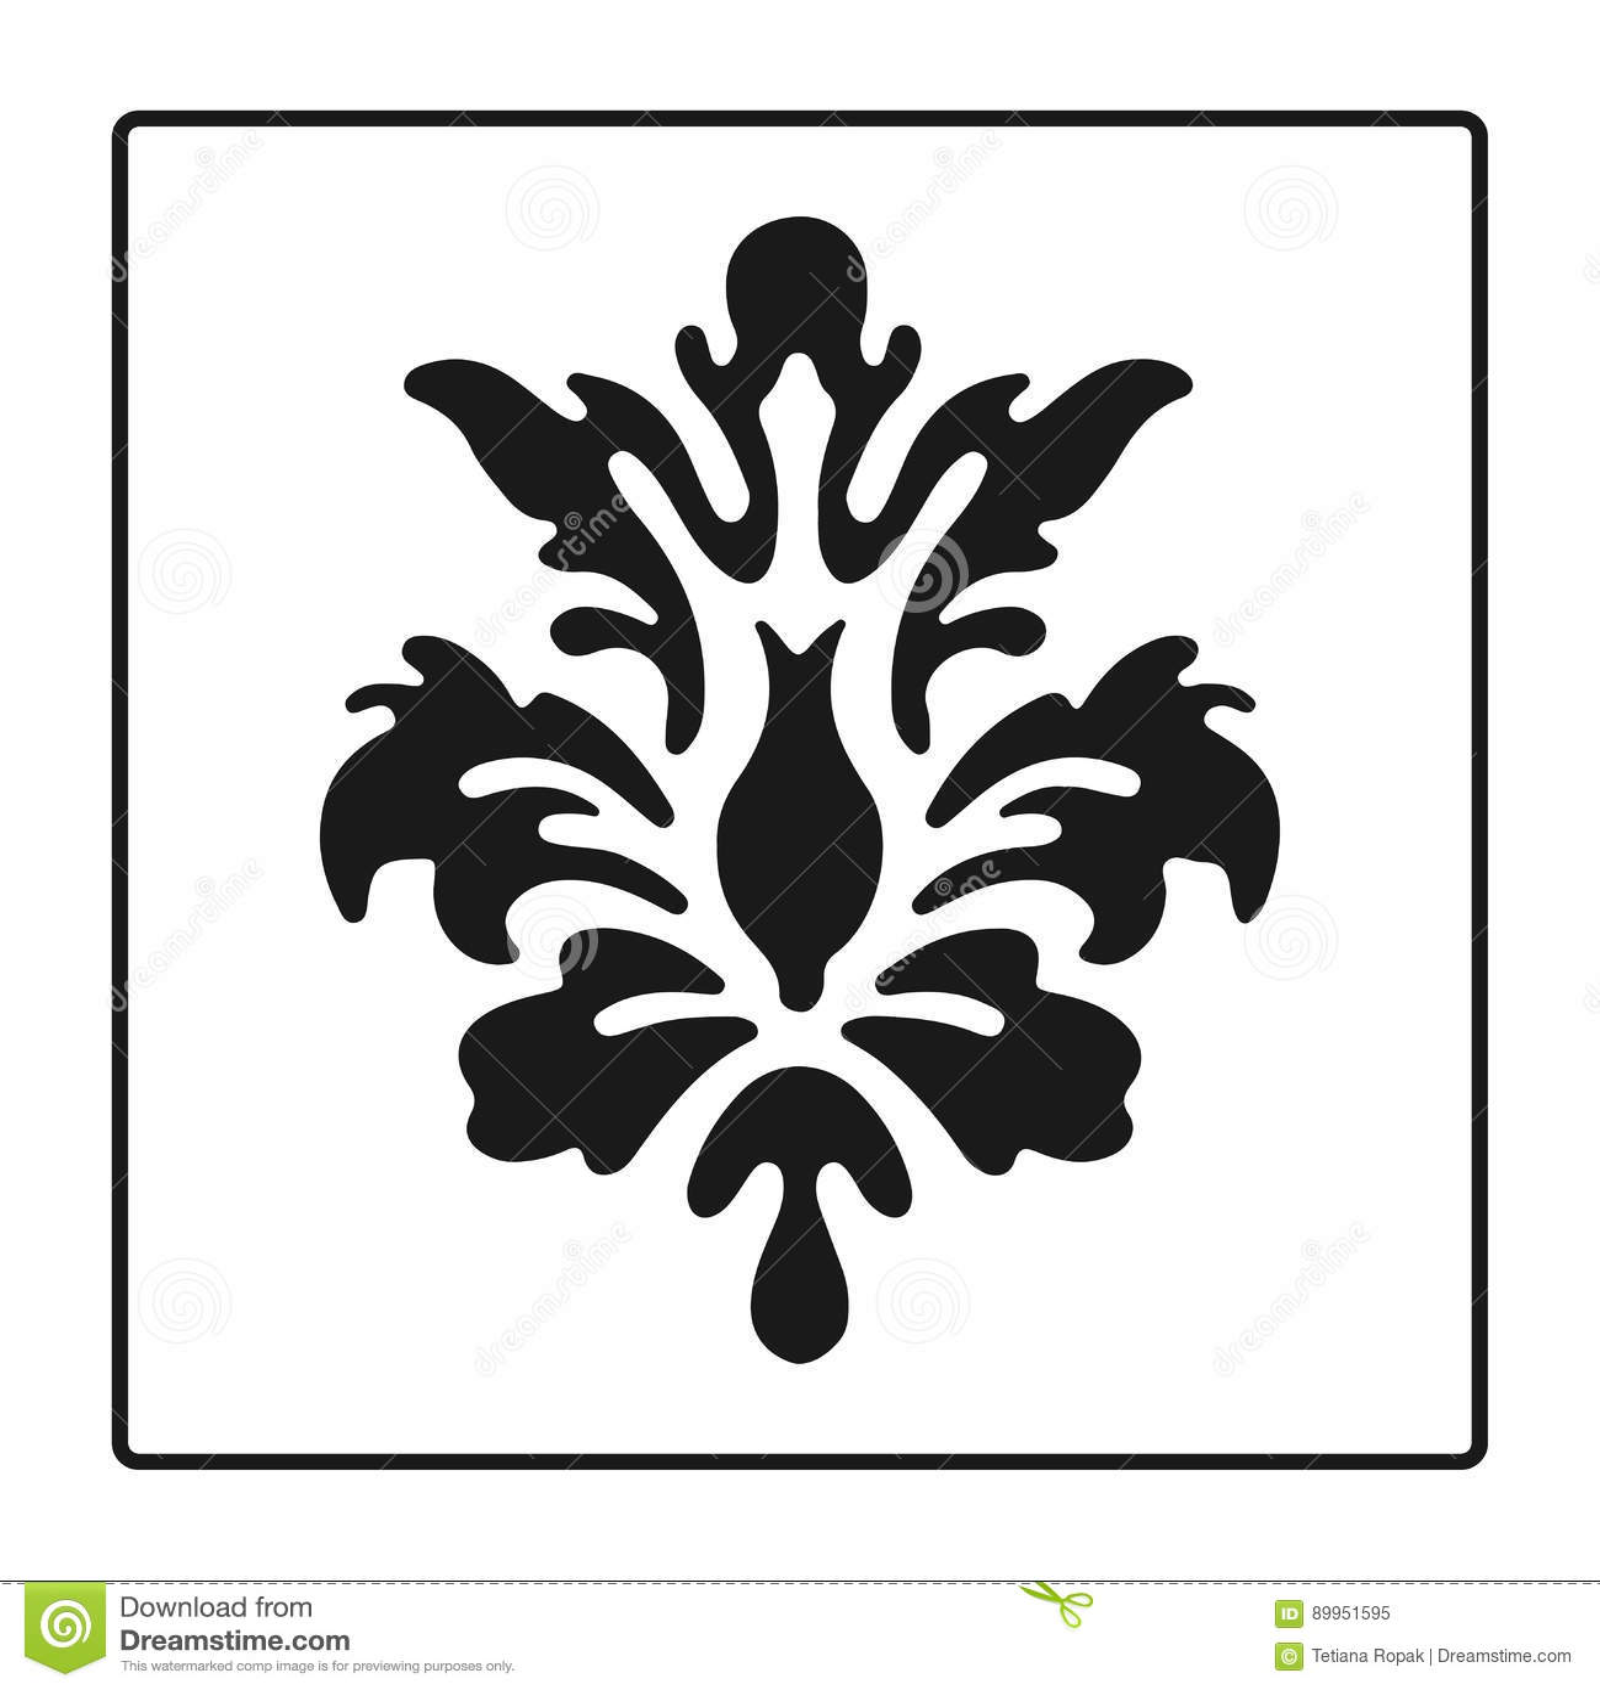 Fleur de lis symbols black silhouettes heraldic symbols vector fleur de lis symbols black silhouettes heraldic symbols vector illustration medieval signs glowing french fleur de lis royal biocorpaavc Gallery